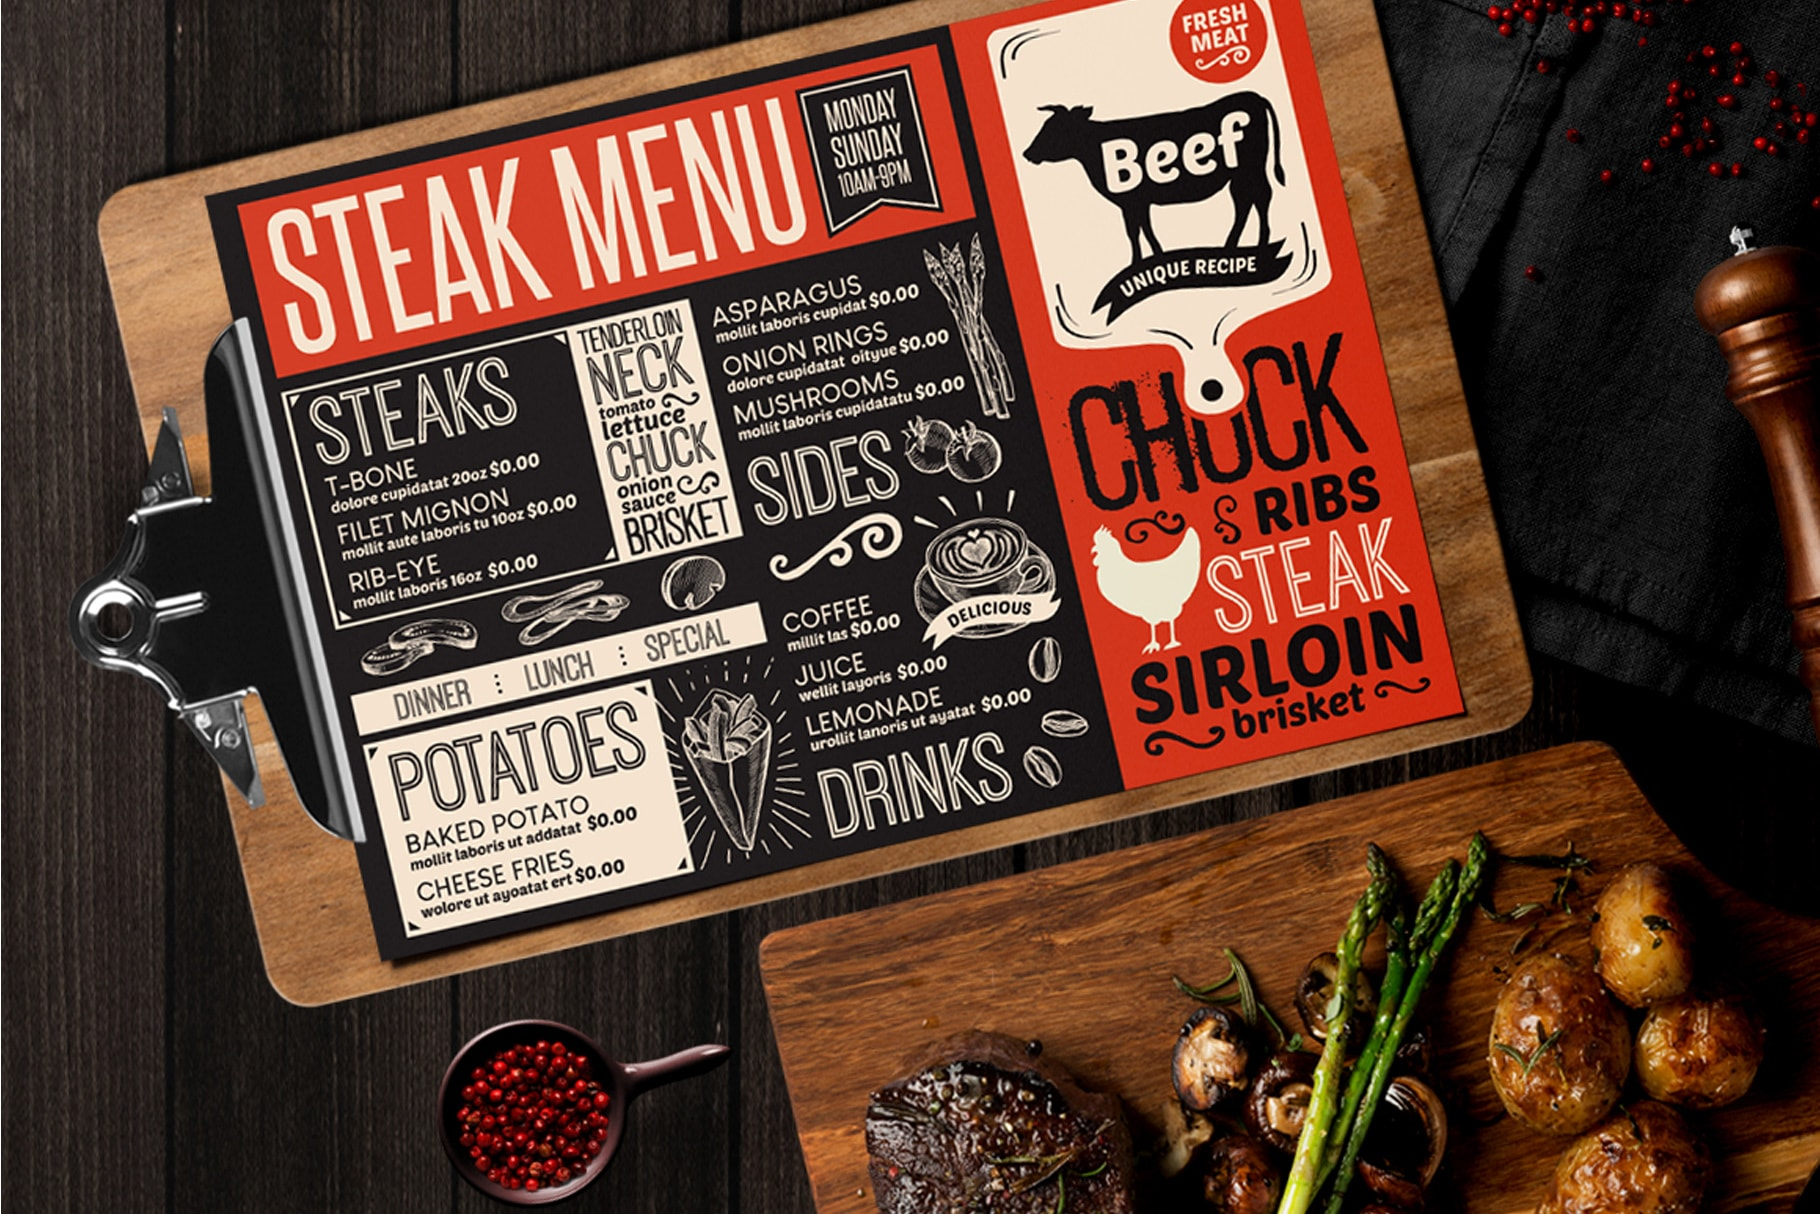 steak burger menu template design for restaurant with hand drawn illustrations